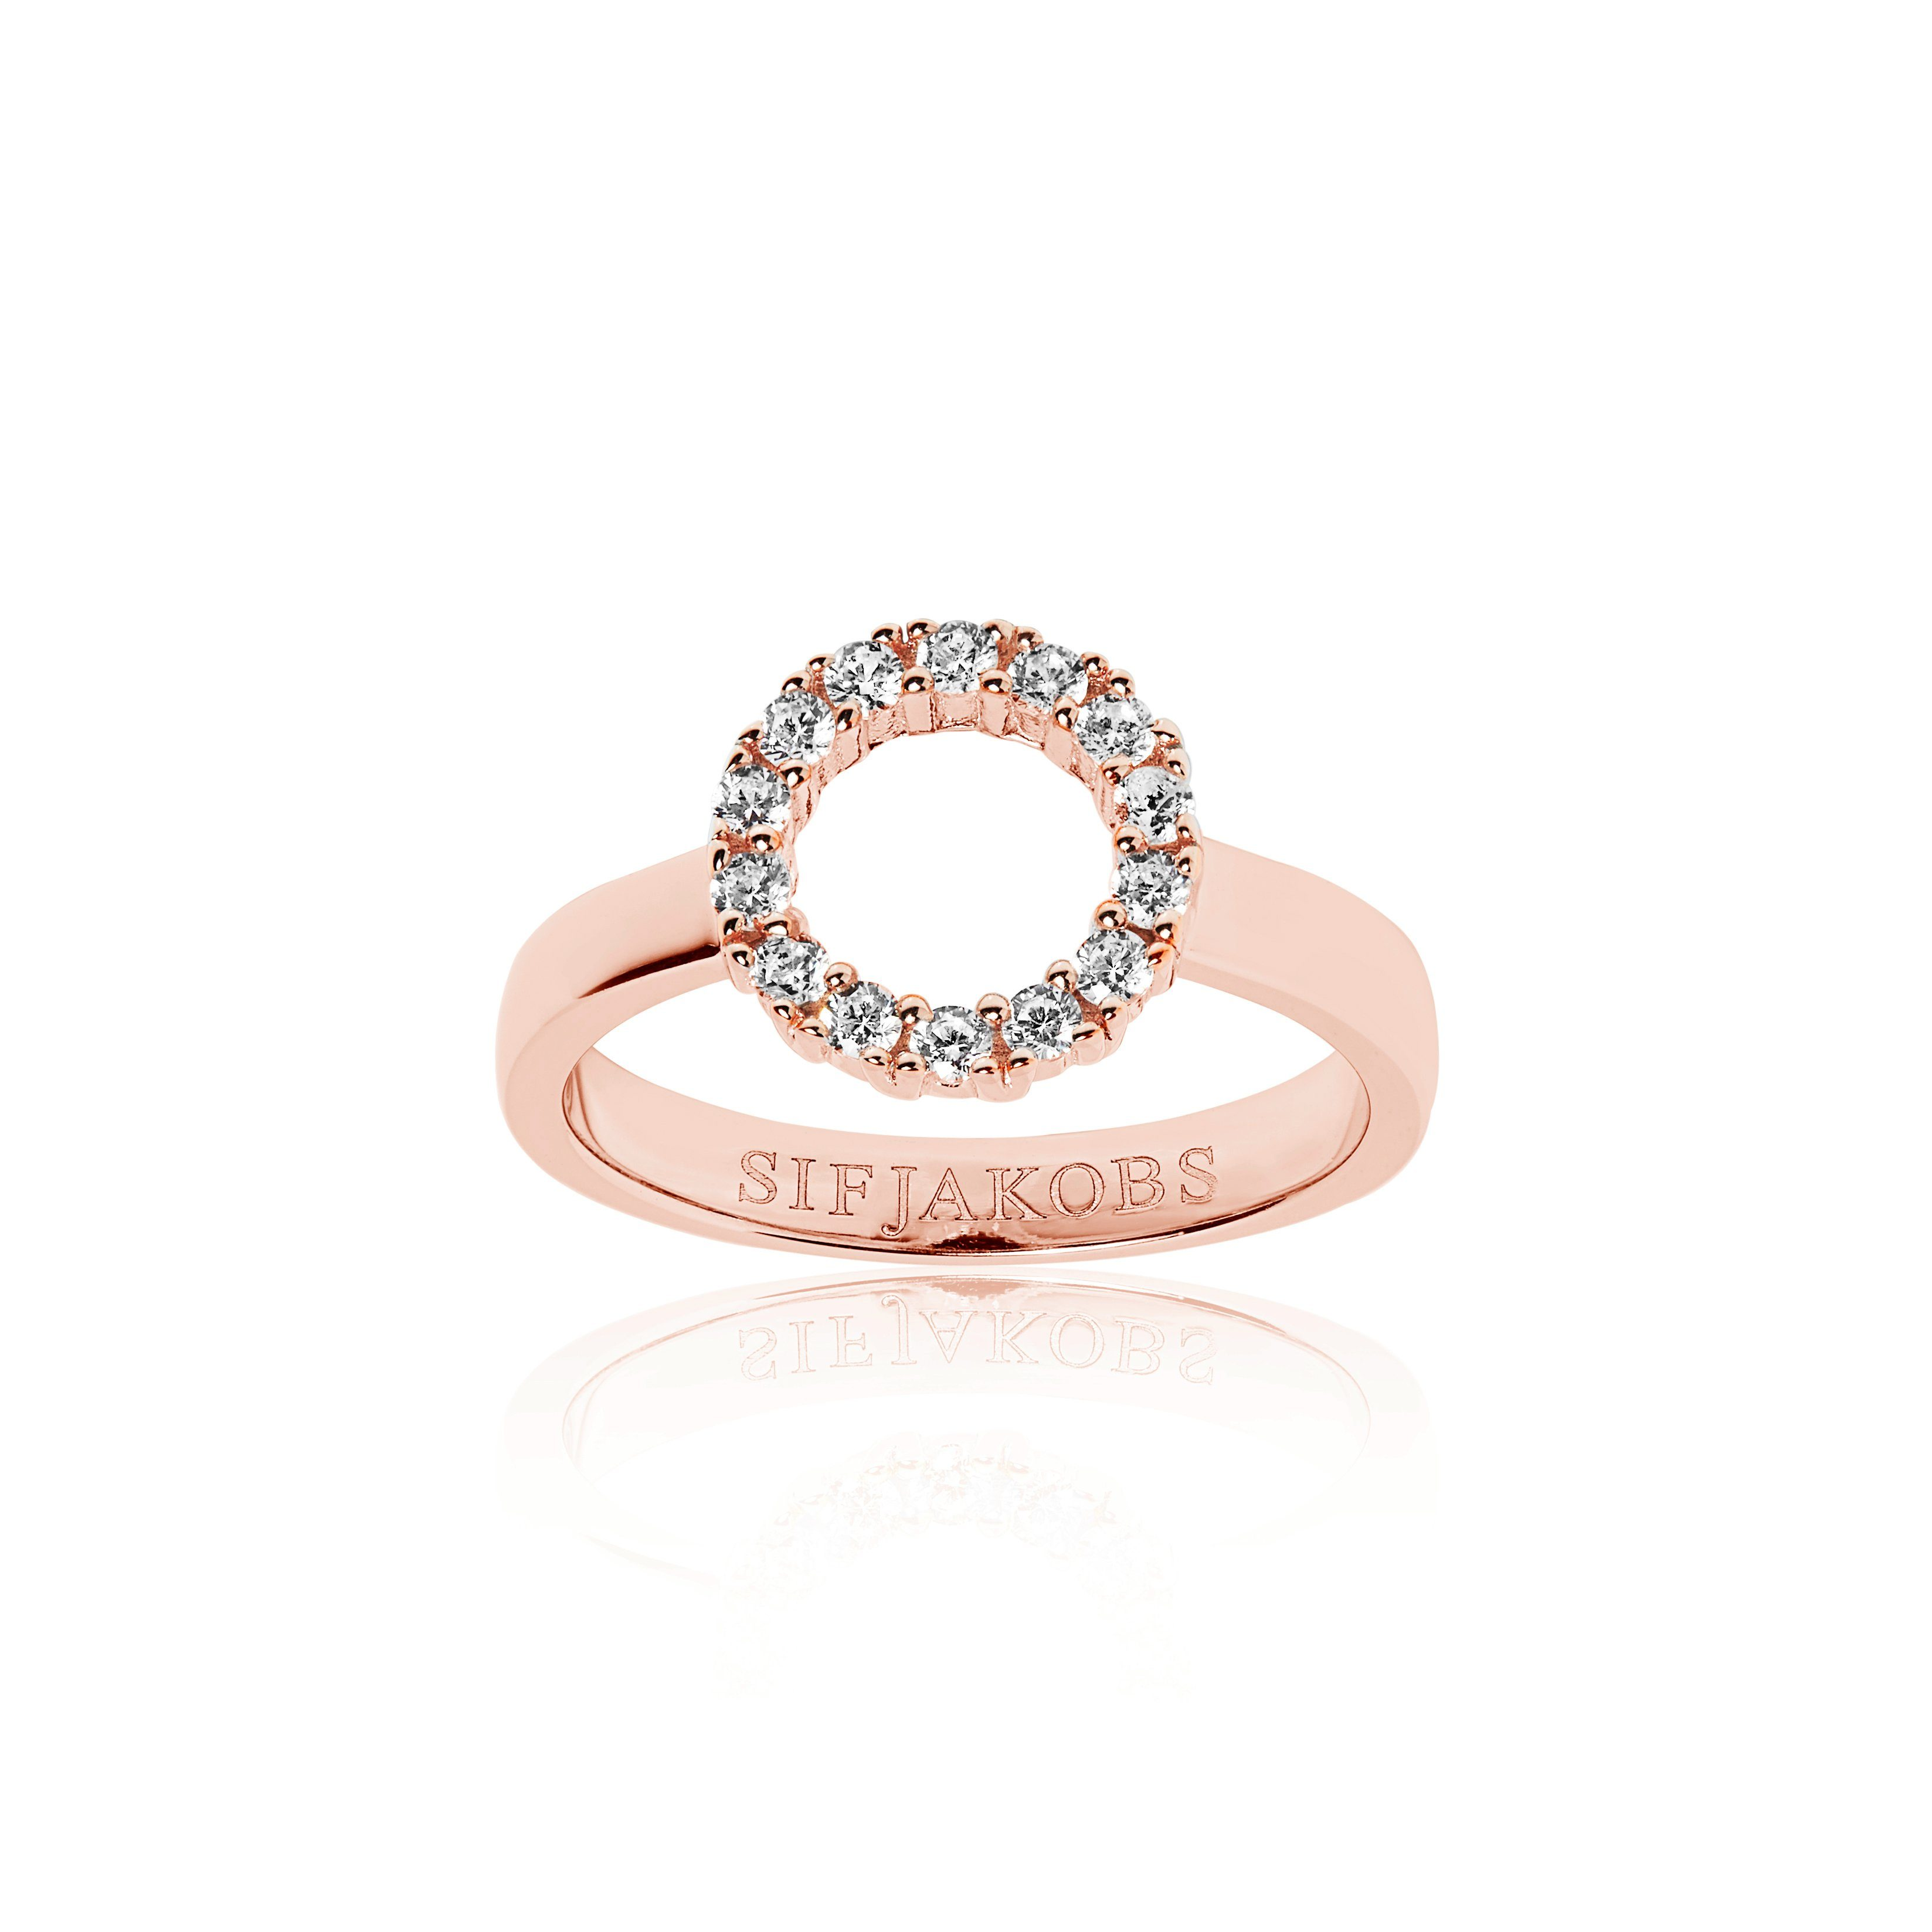 Sif Jakobs Jewellery Ring im angesagten Design   OTTO